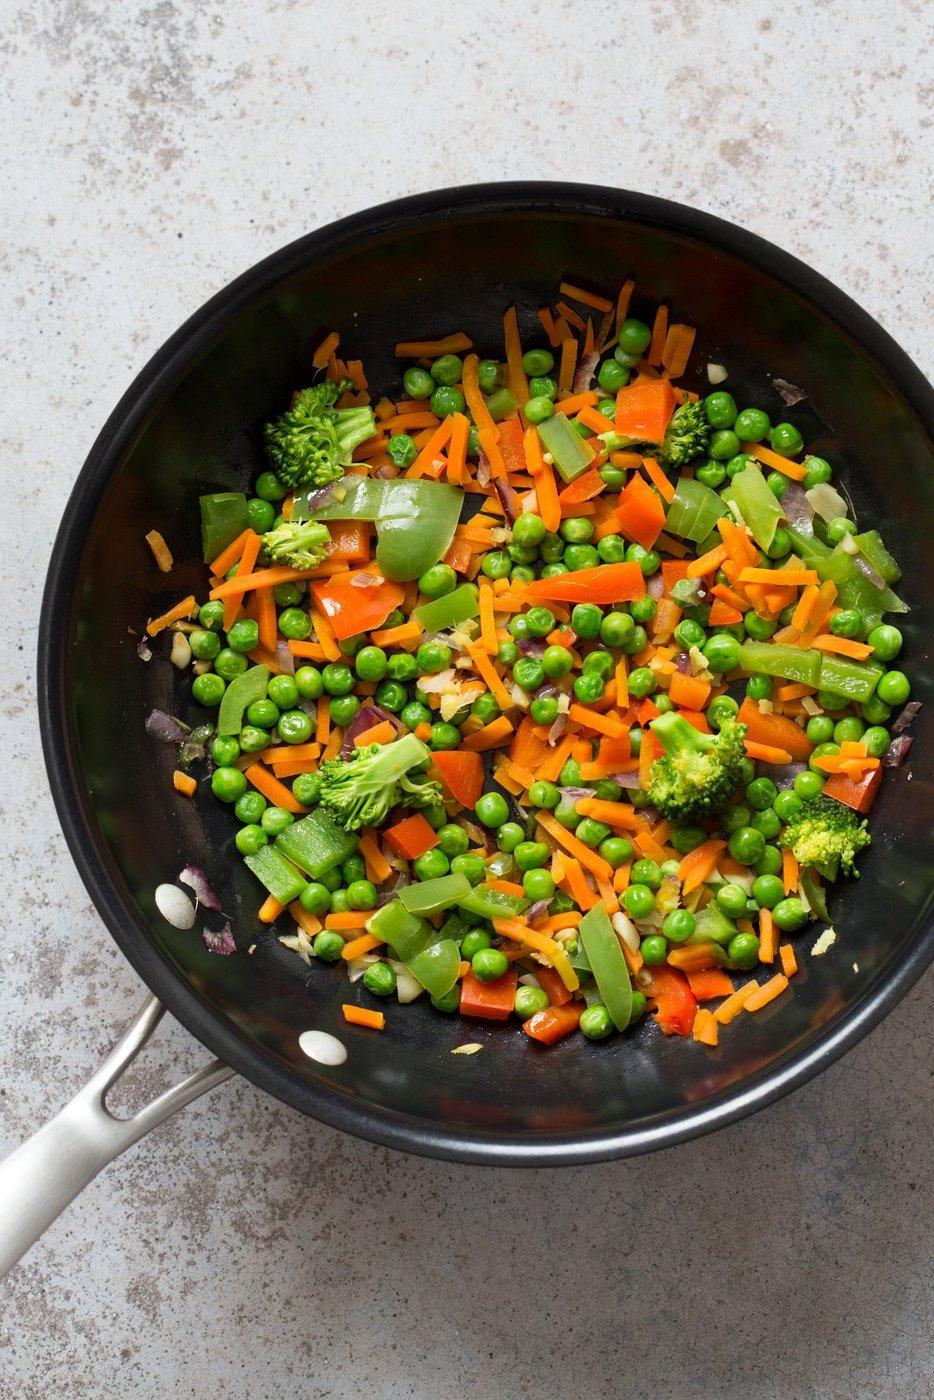 Cauliflower Fried Rice. Easy 1 Pot Fried Rice. No grains, low carb. So fluffy and so good. #Vegan #Glutenfree #Grainfree #Nutfree #Recipe #veganricha | VeganRicha.com